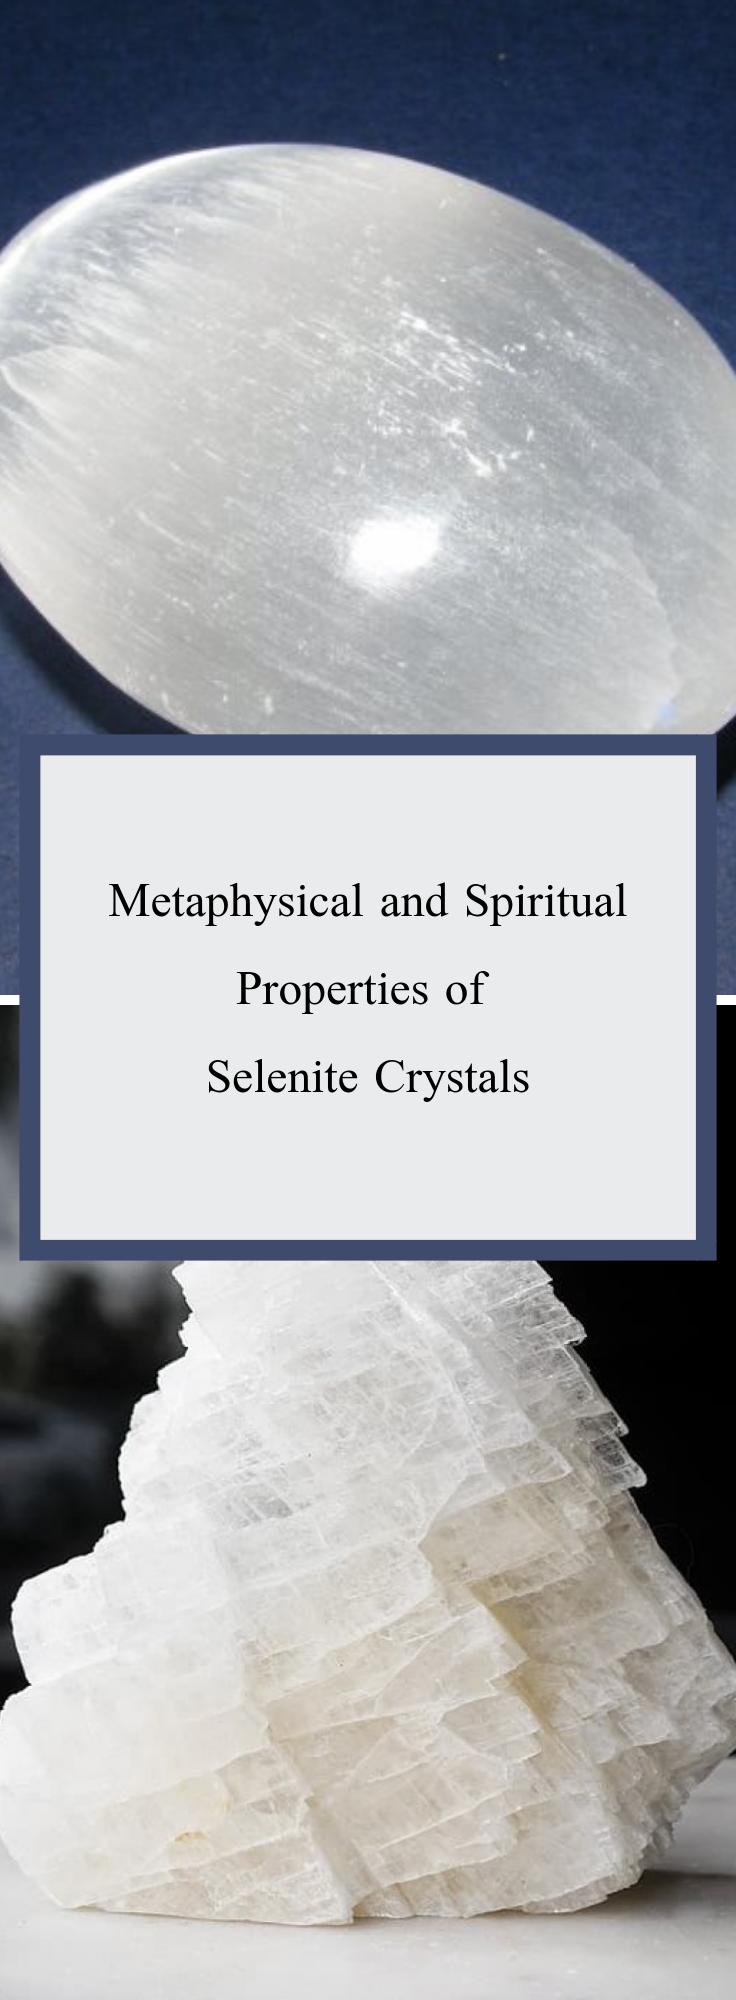 Home Ayana Products Selenite Crystal Crystals Chakra Crystals